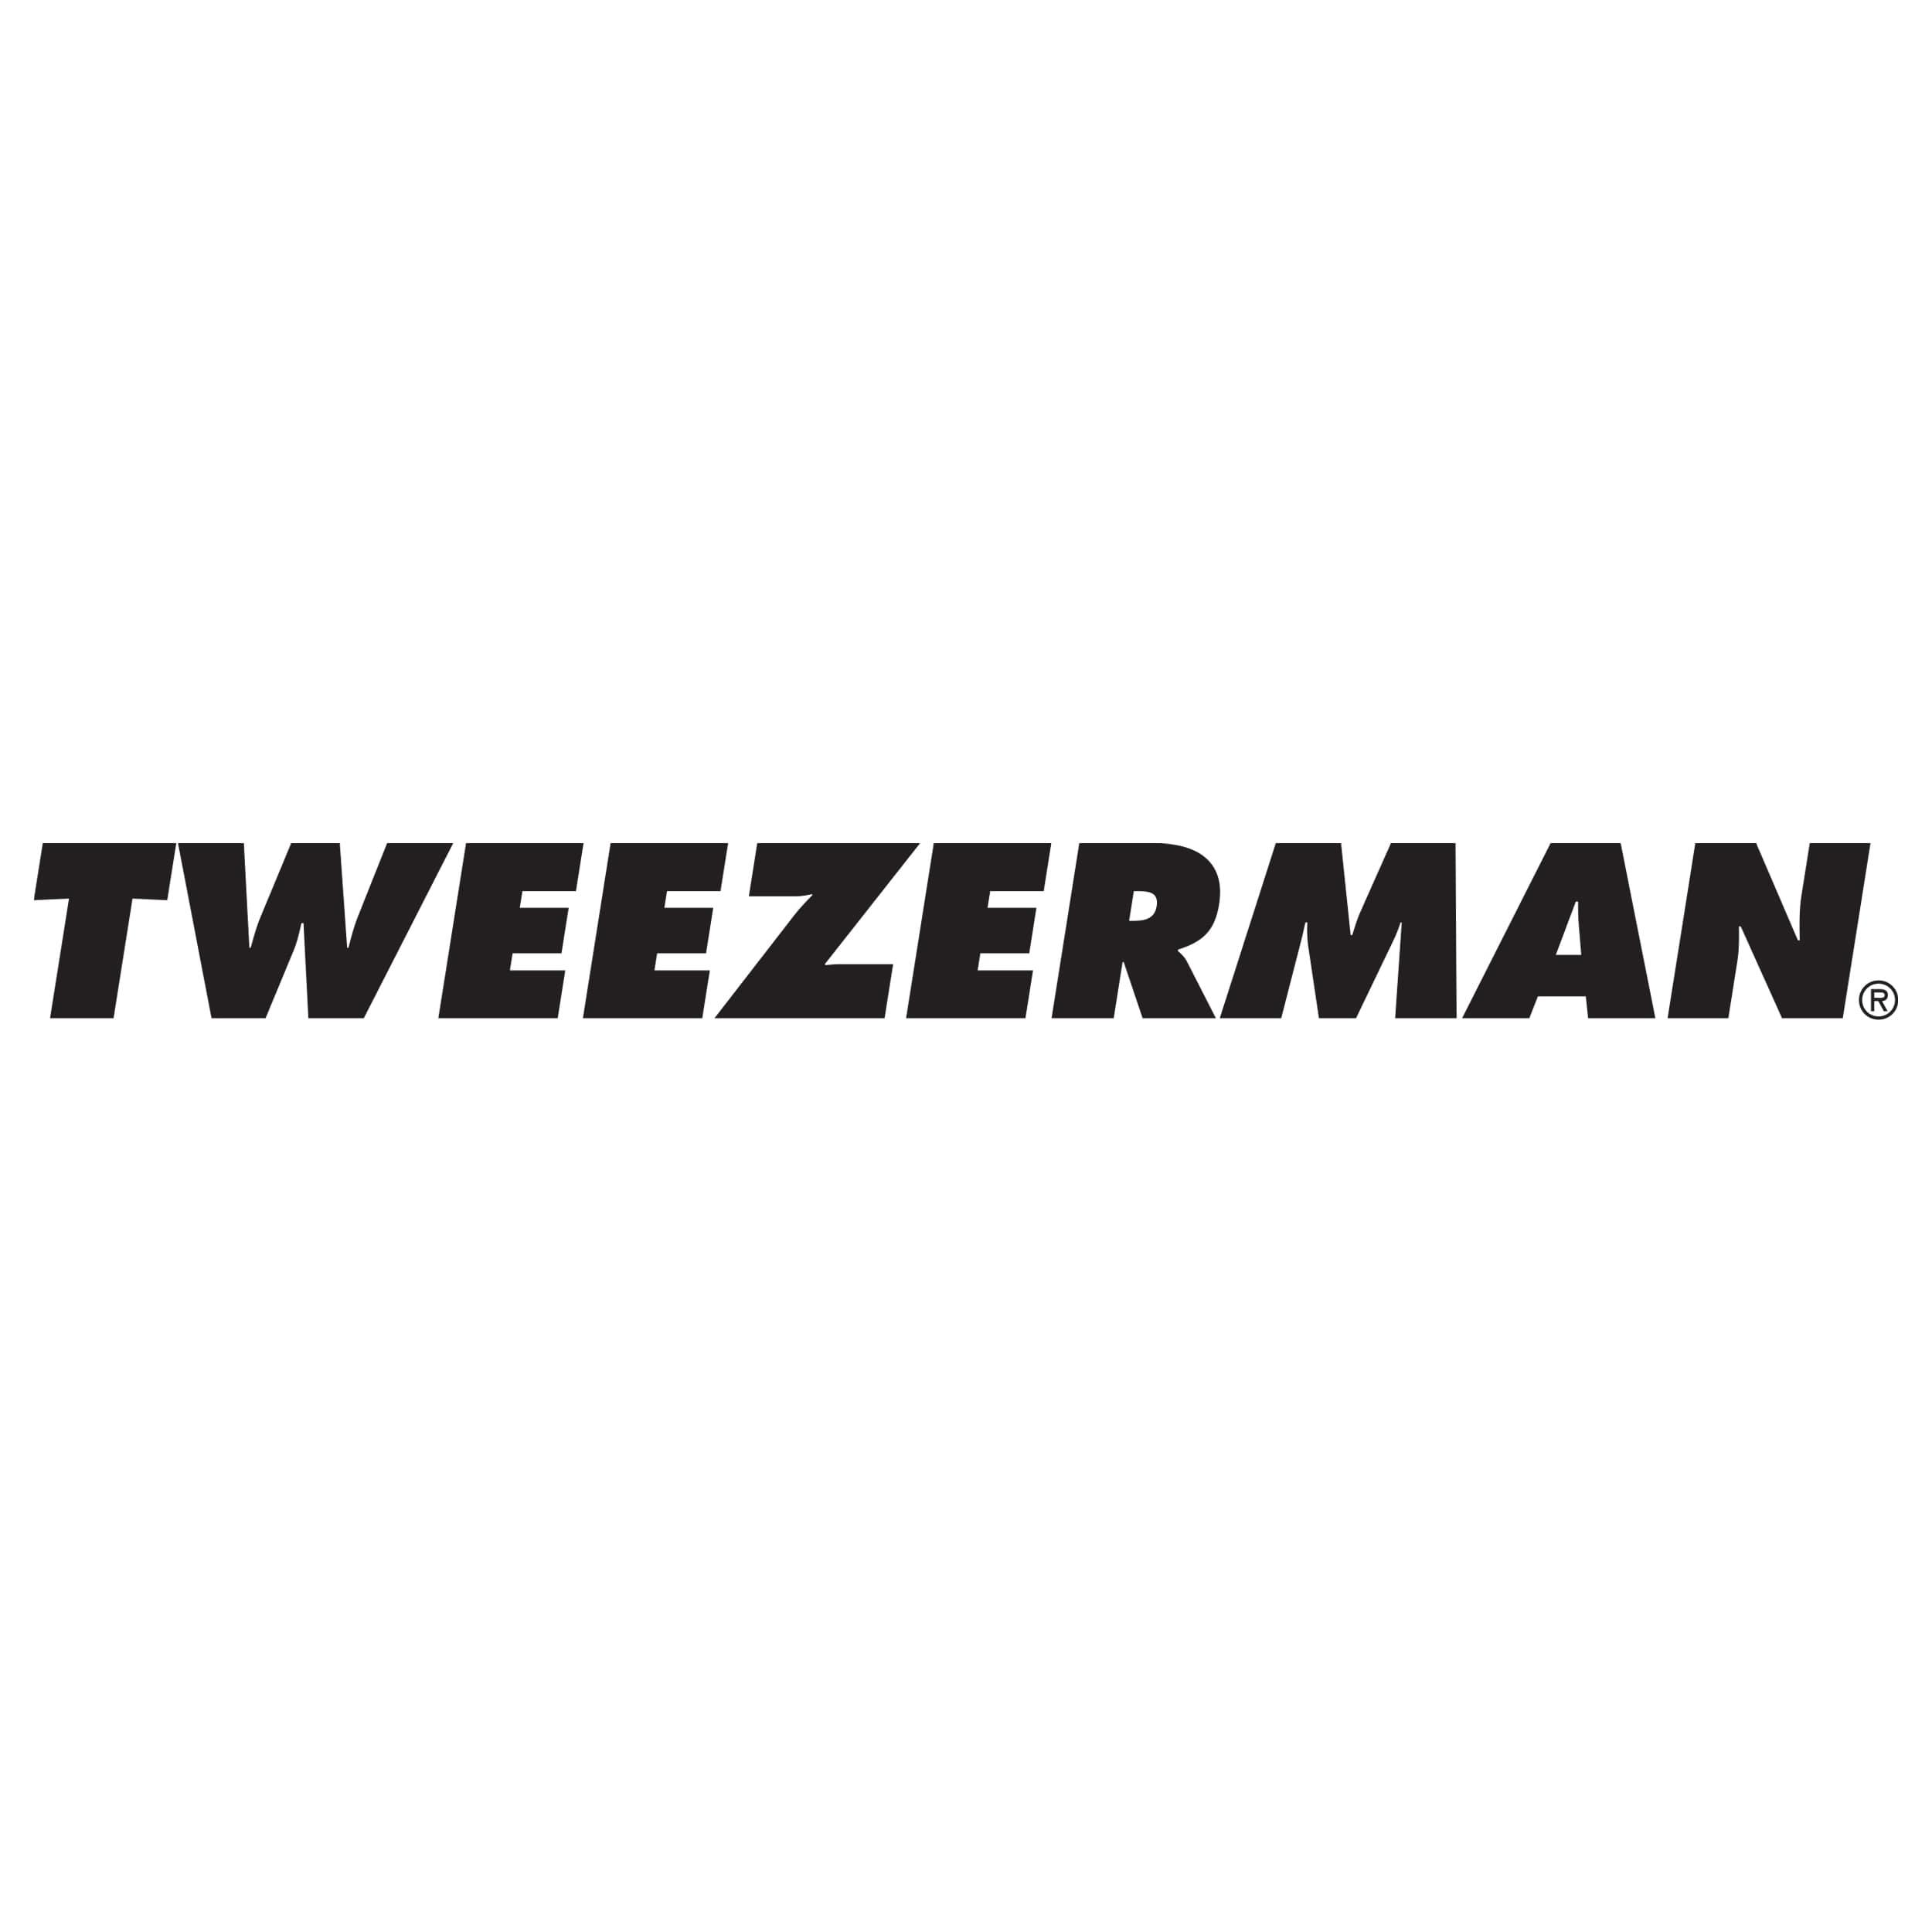 tweezerman logo. tweezerman logo